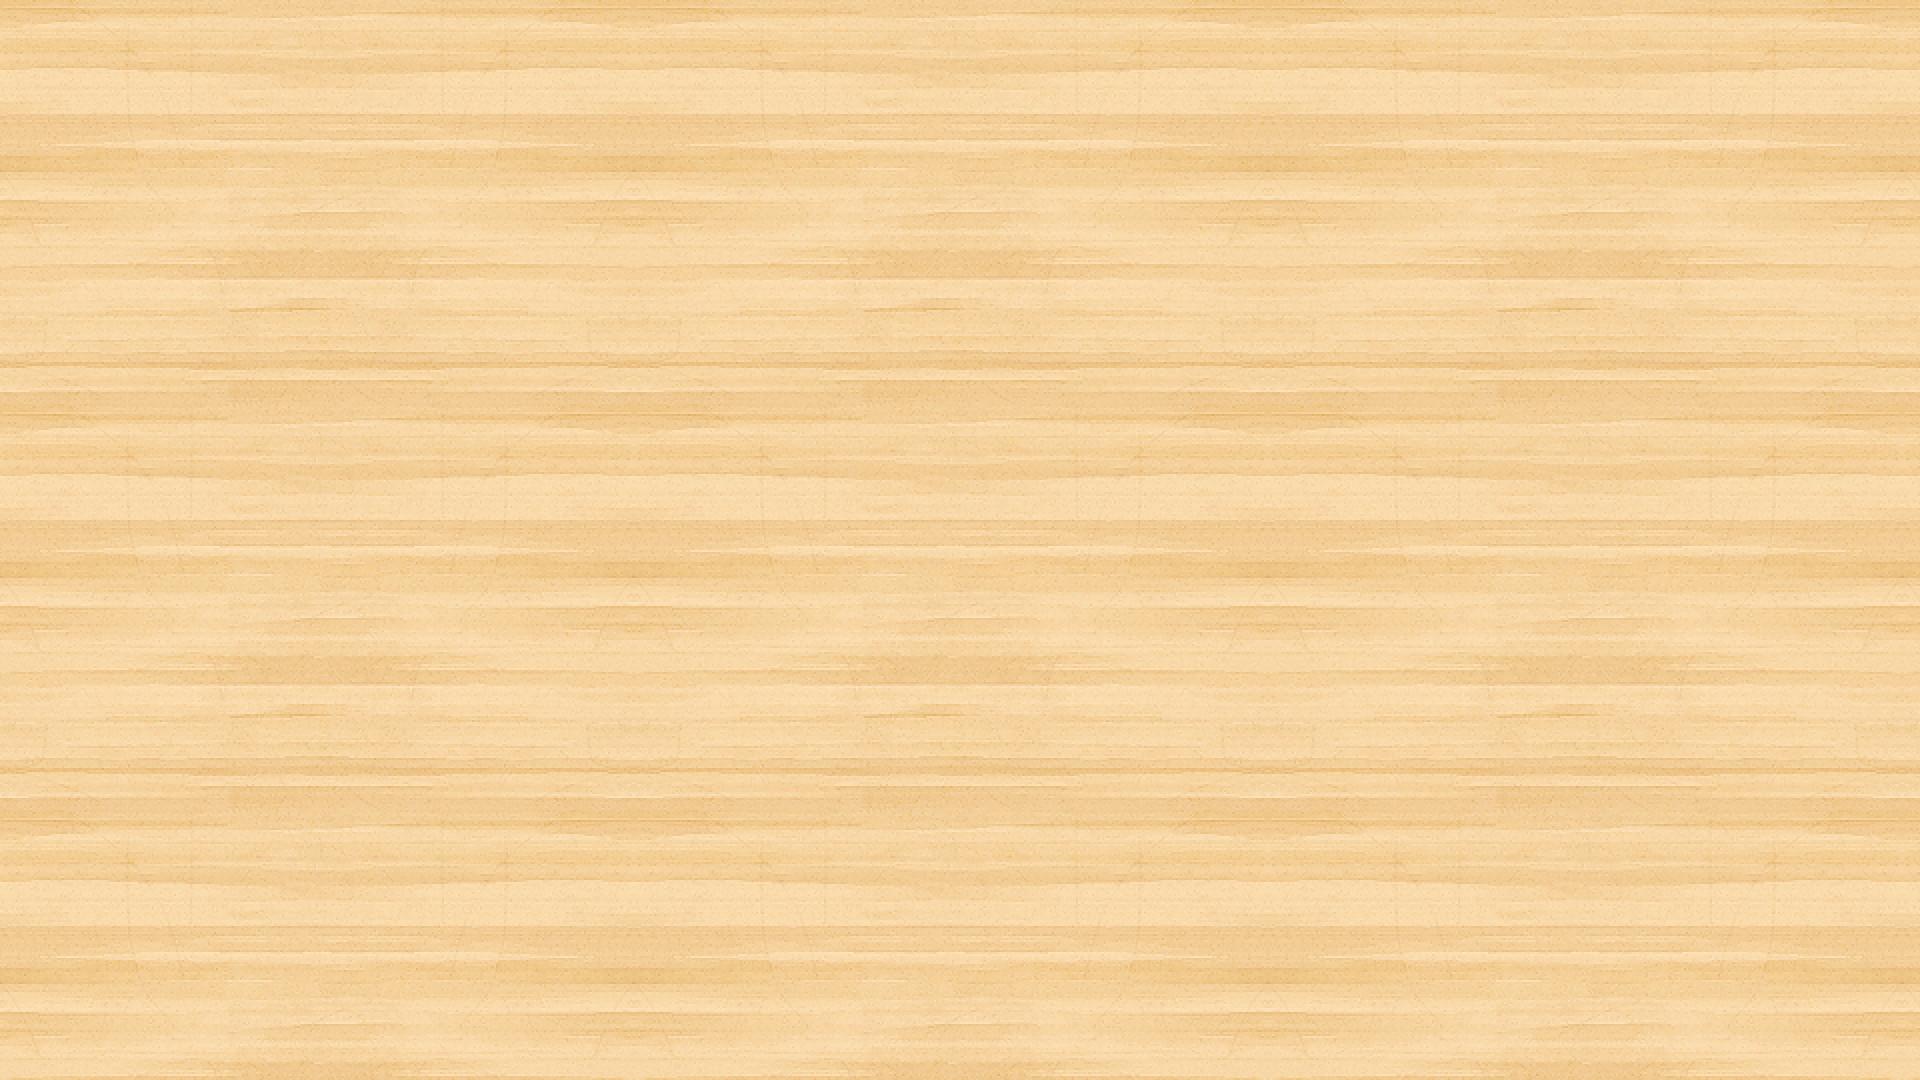 … Classy Ideas Light Wood Floor Background 4 Light Wood Floor Background  Info Home And Furniture Decoration …